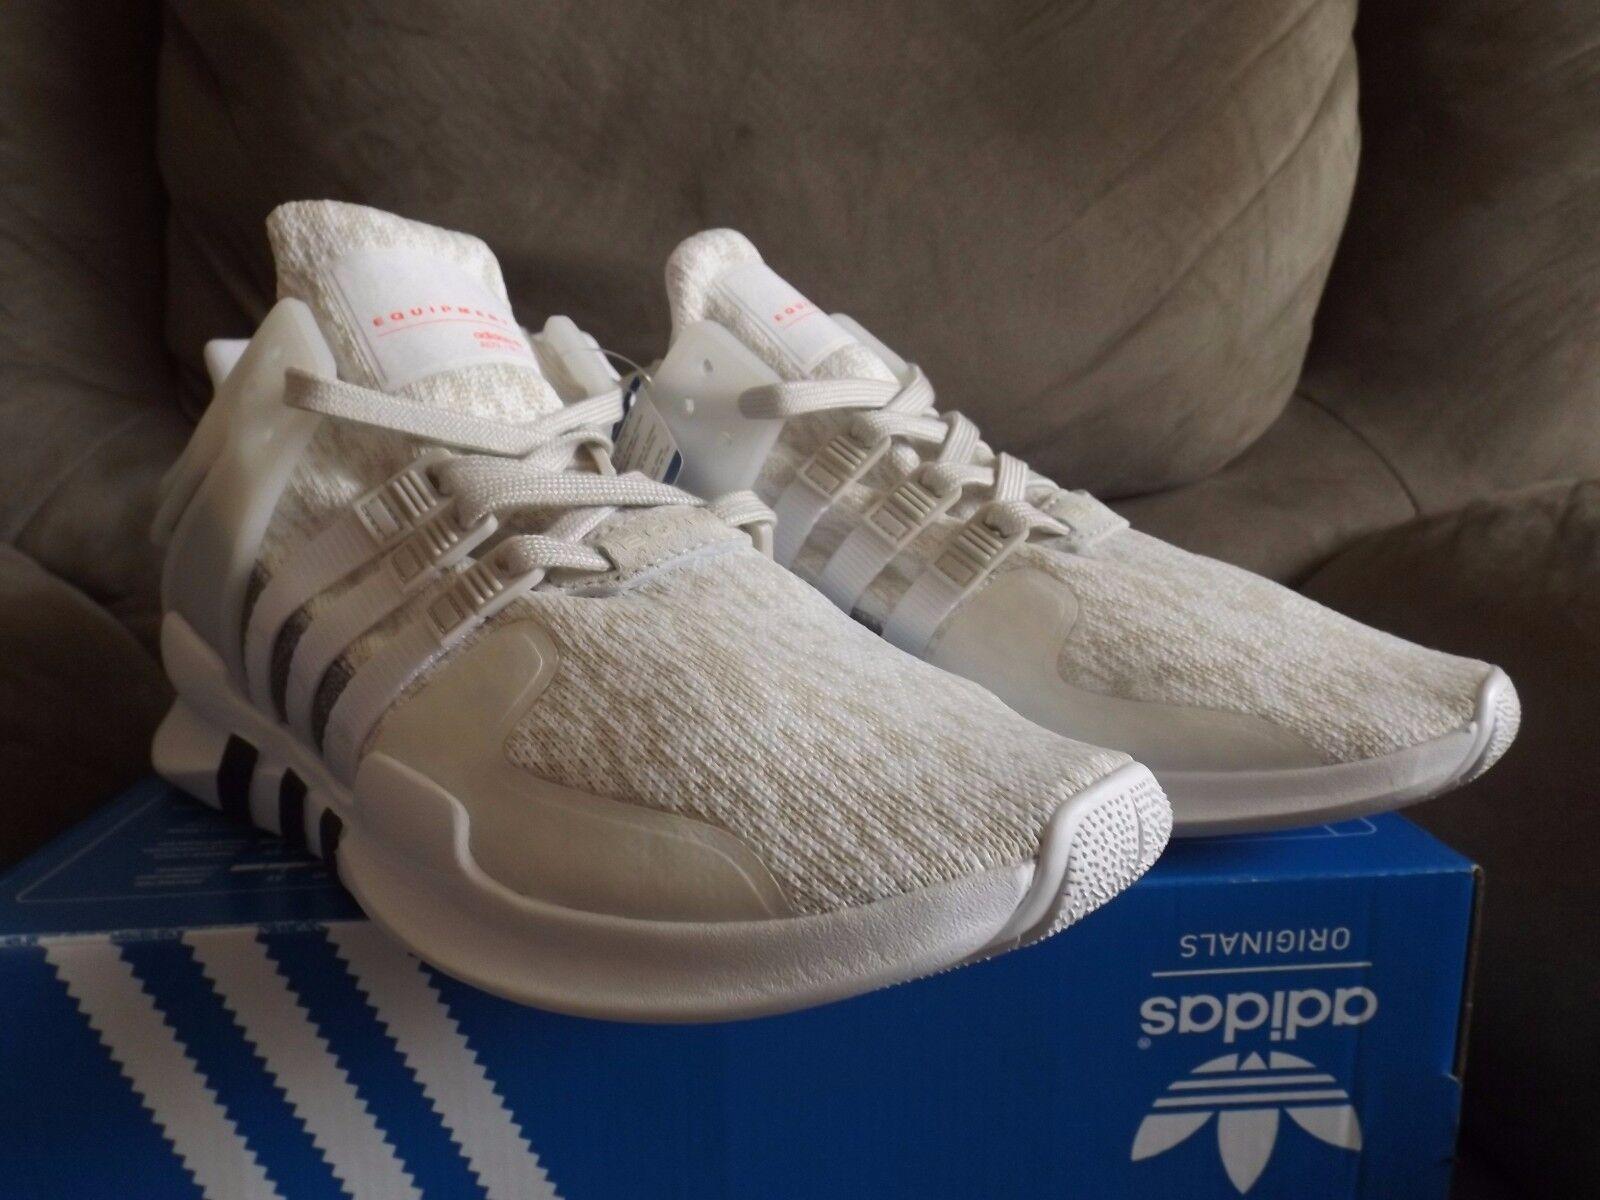 Adidas Originals Equipment Support Support Support EQT ADV Women's shoes Size 10 (NEW) BA7593 db5d93